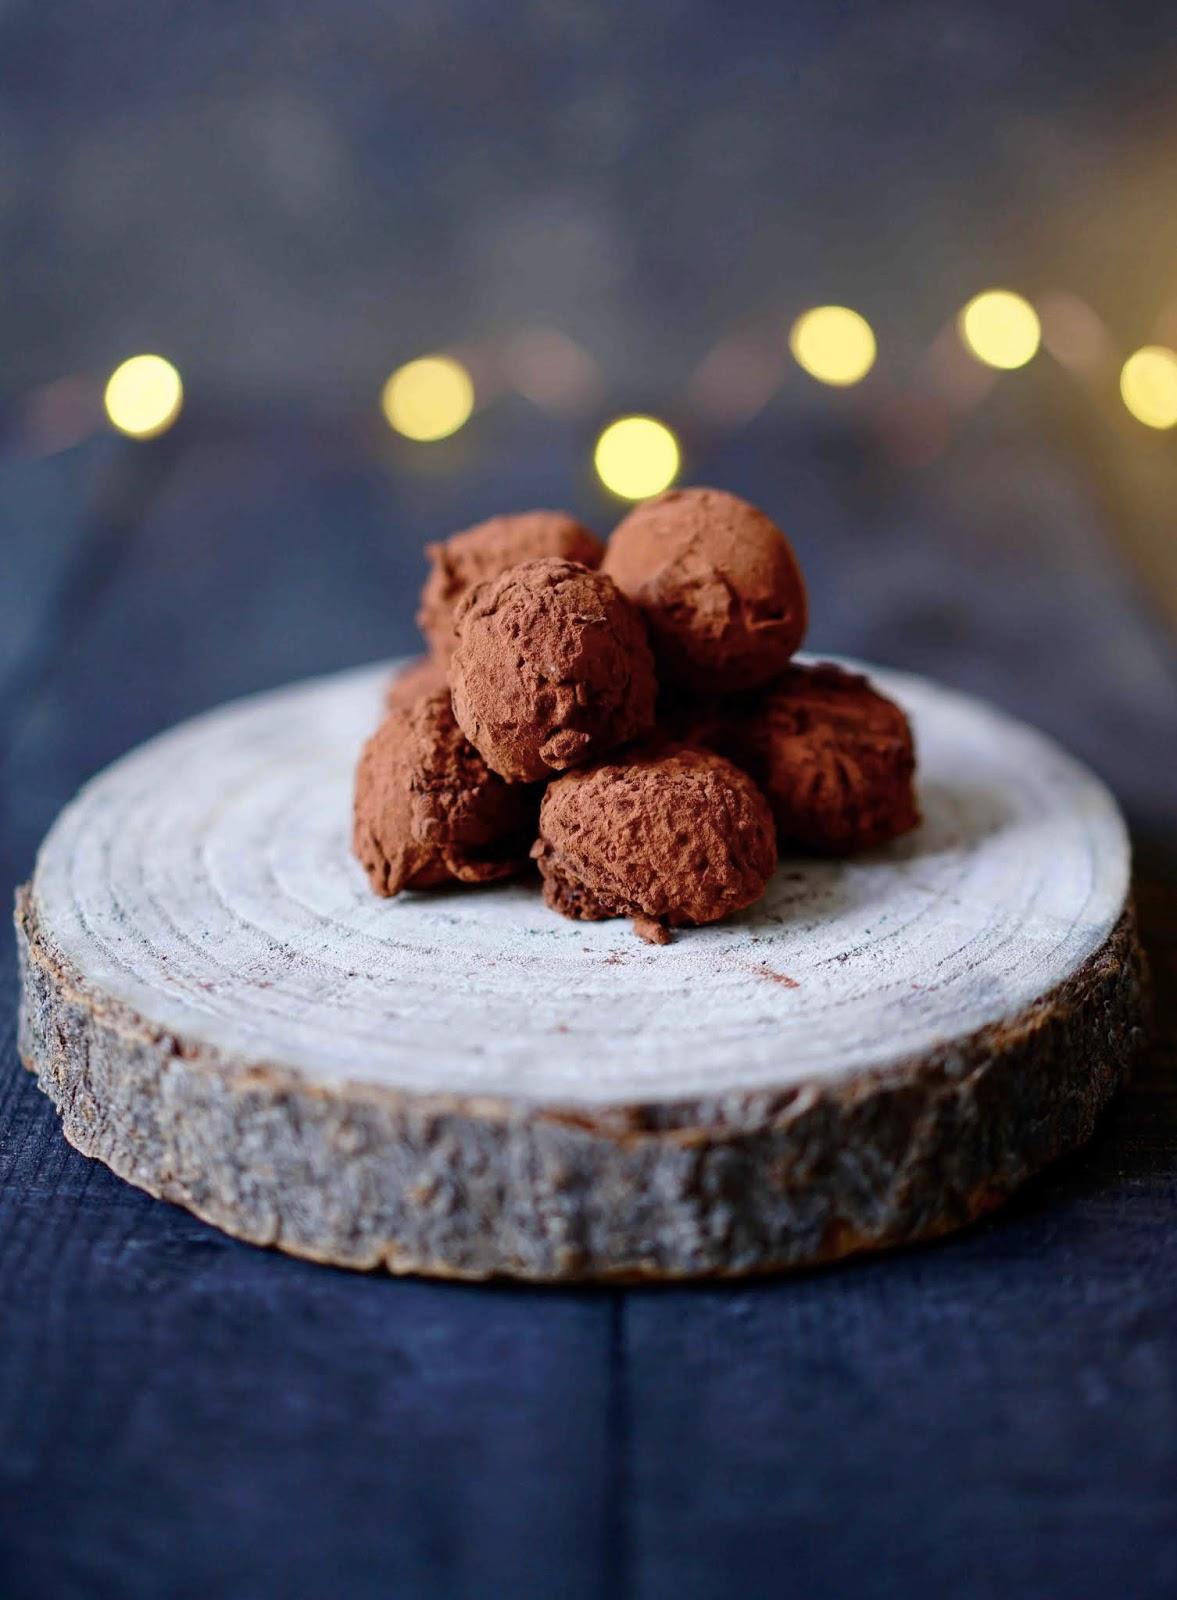 enrobage chocolat Dulcey , Valrhona , truffes fondantes , ganache chocolat , recettes de noËl